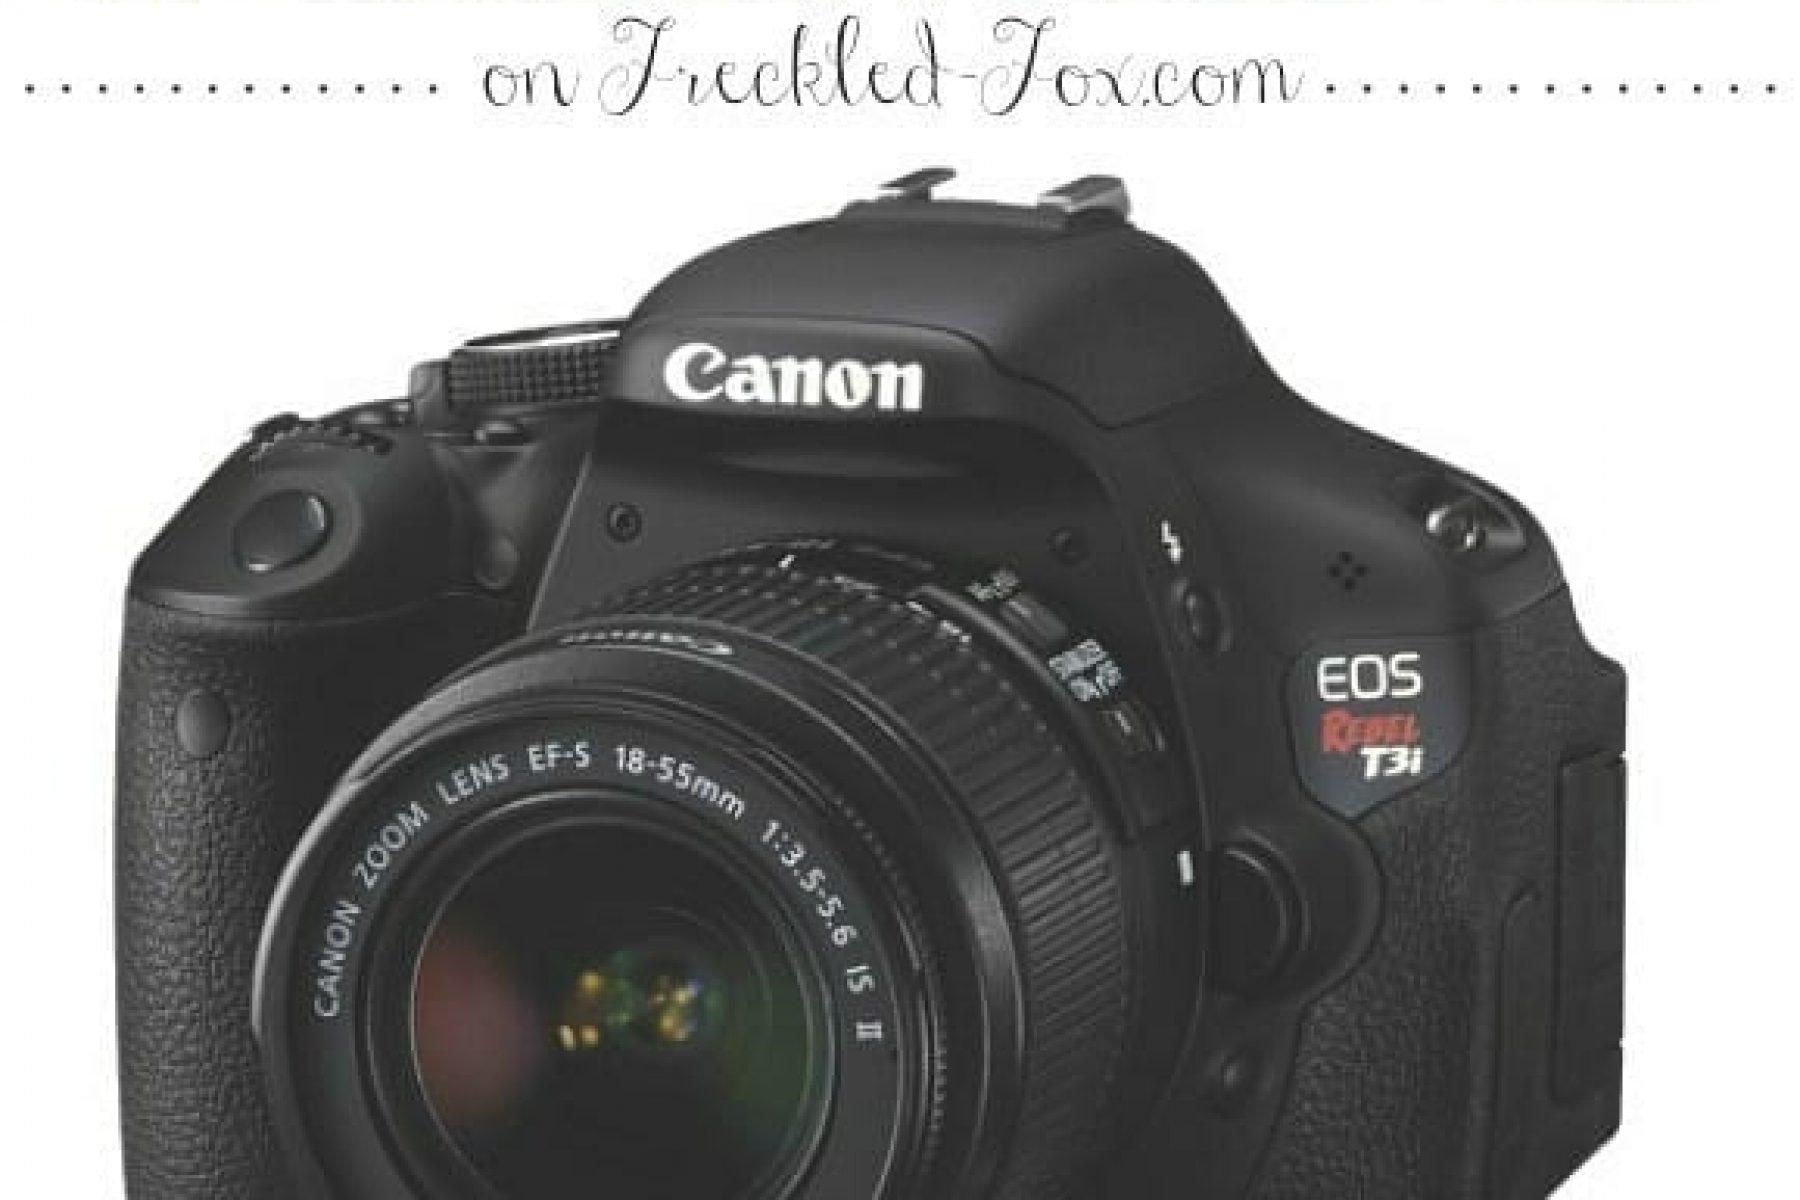 Freckled_fox_canon_rebel_giveaway_Group_sponsor_collaboration_october